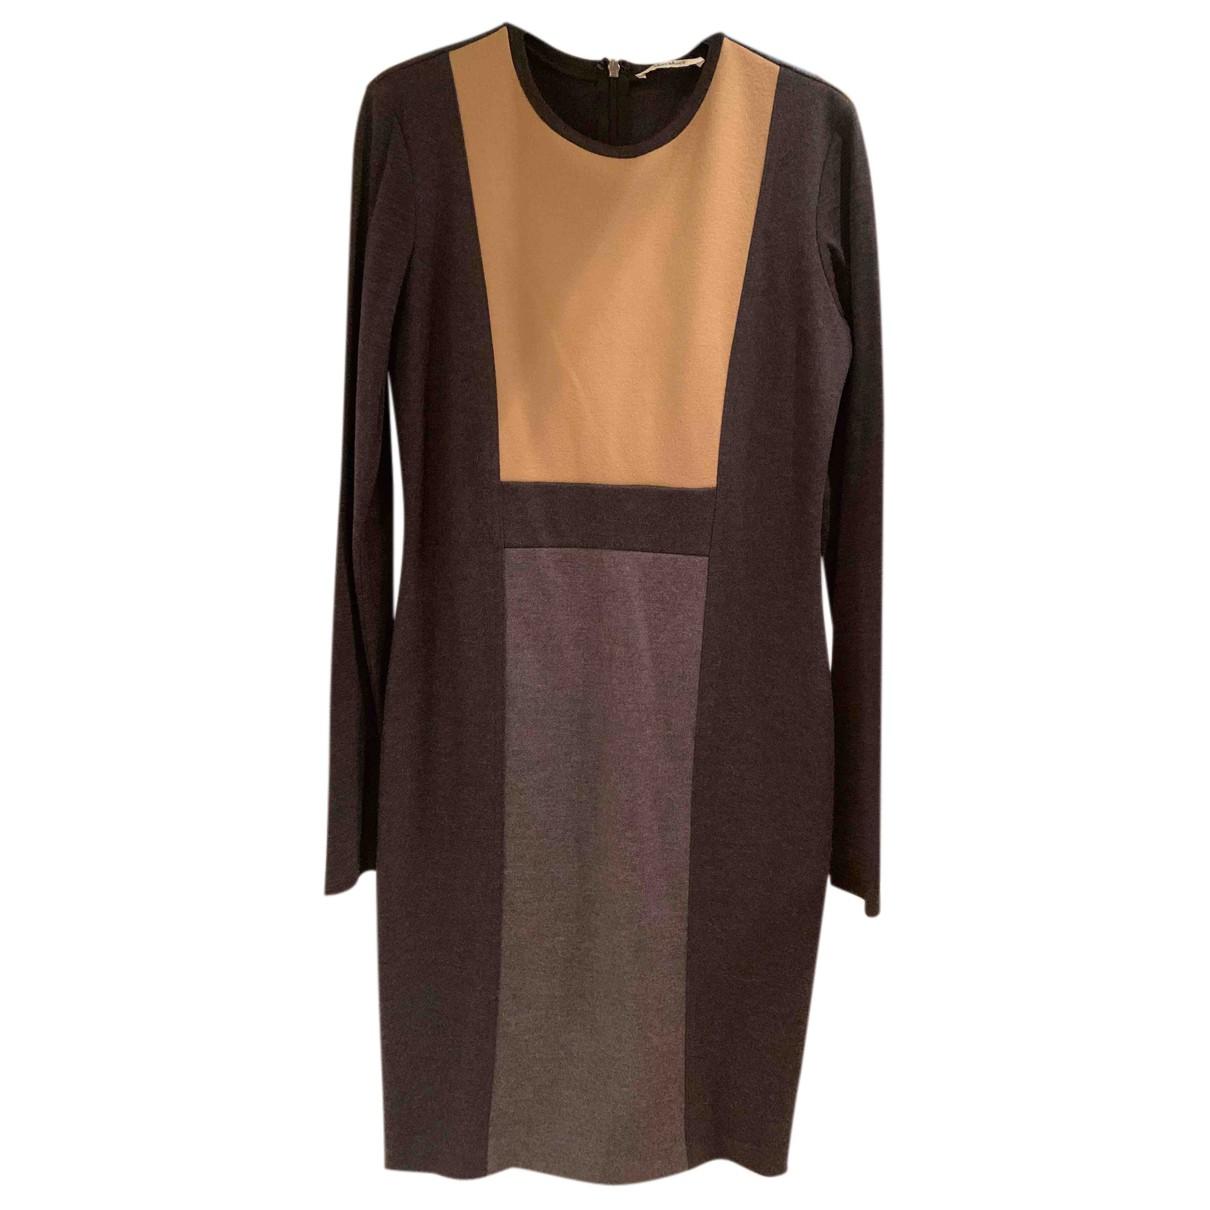 Max Mara N Grey Wool dress for Women 42 IT